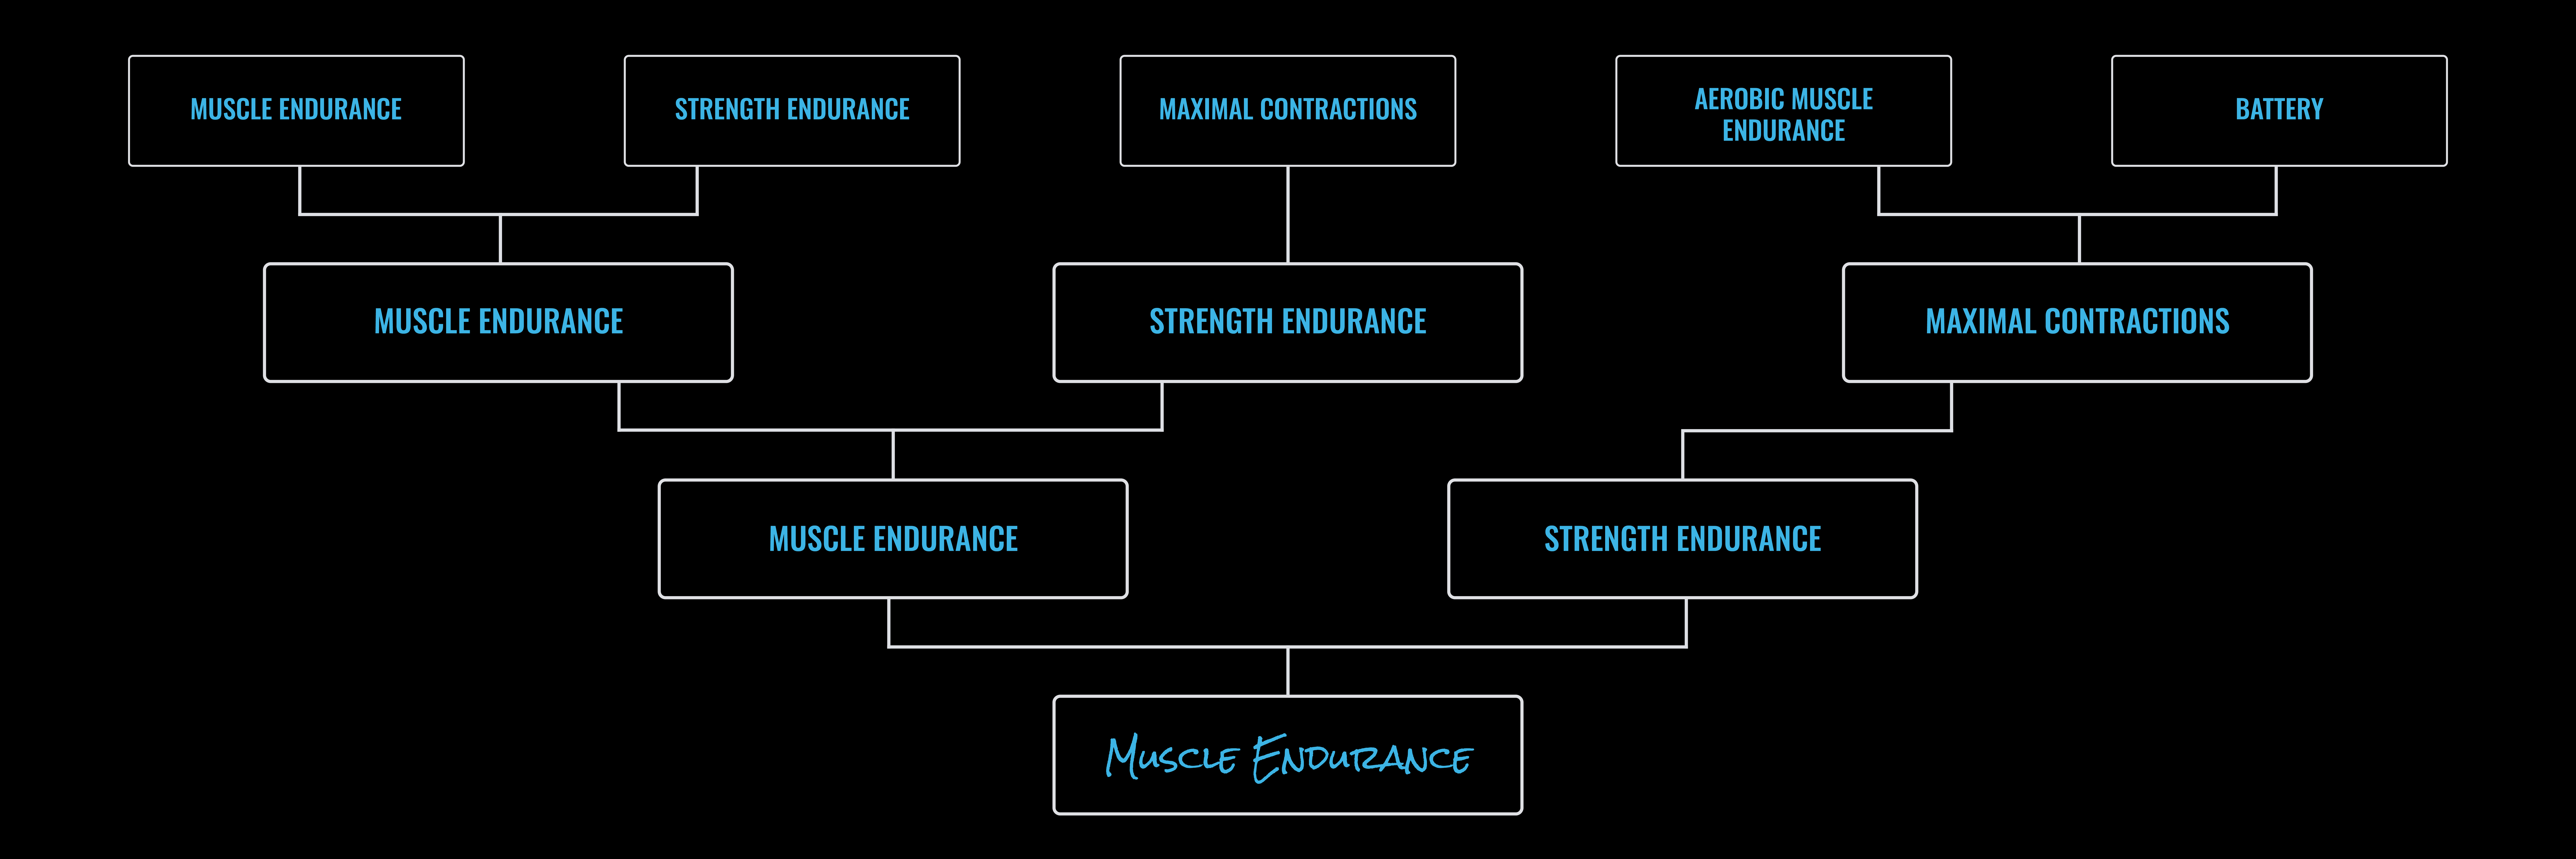 Muscle Endurance Tree